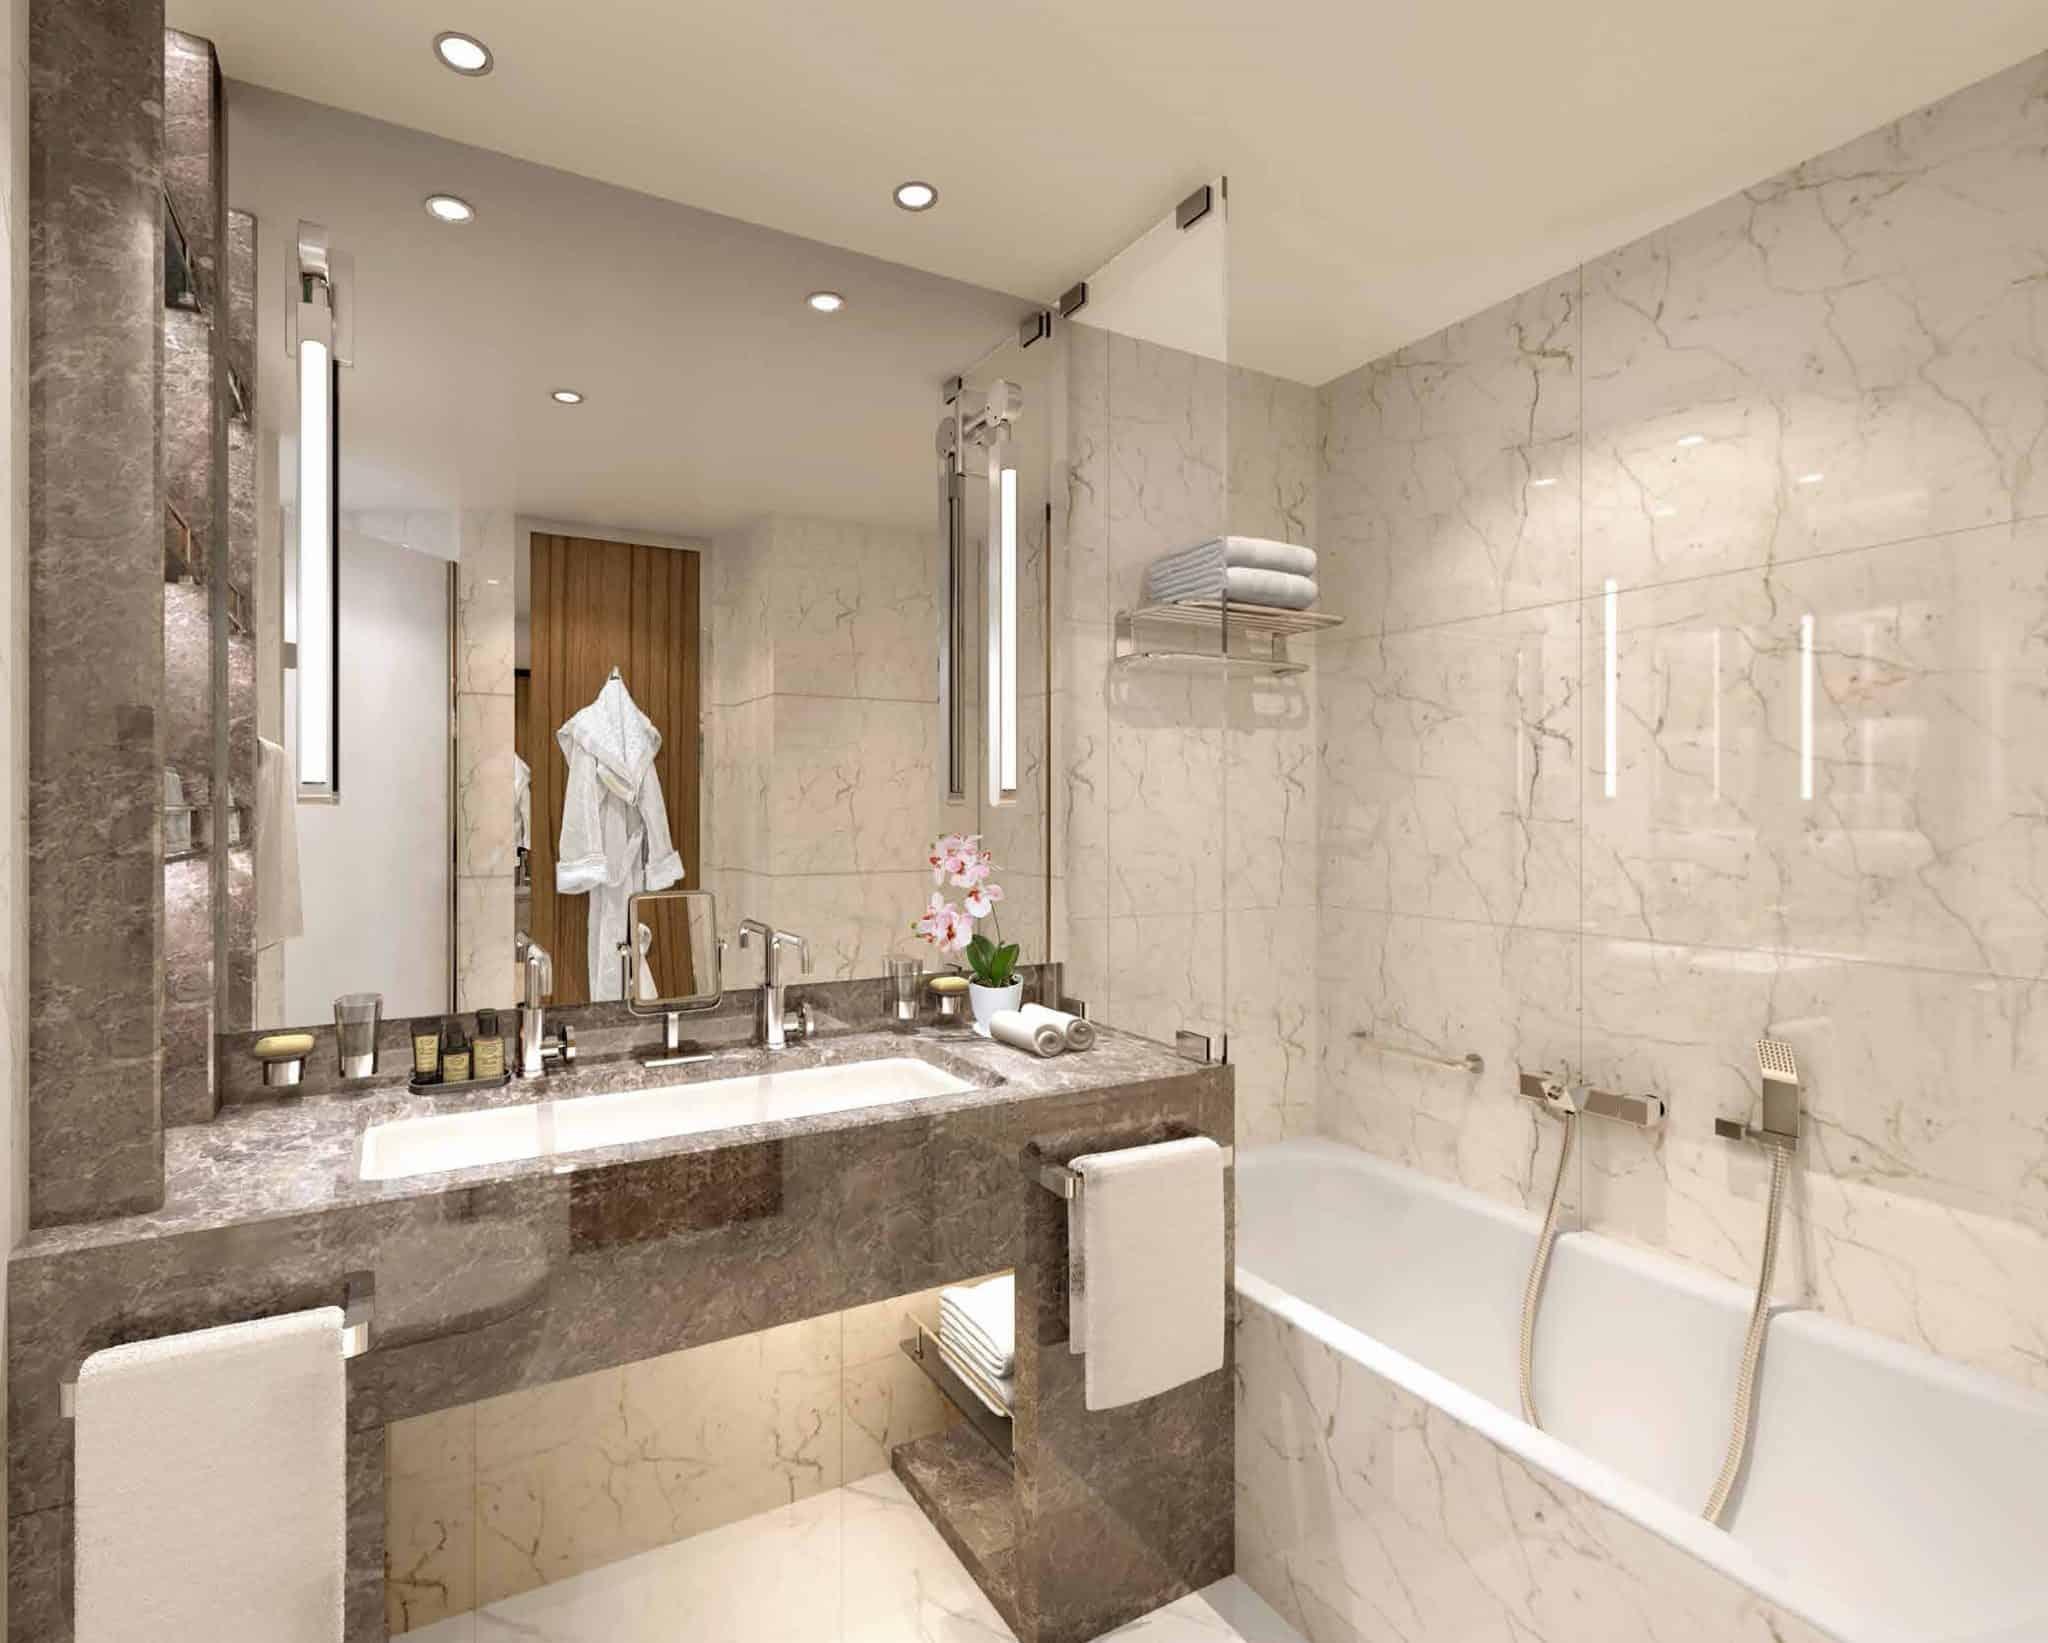 seabourn venture veranda suite bathroom rendering